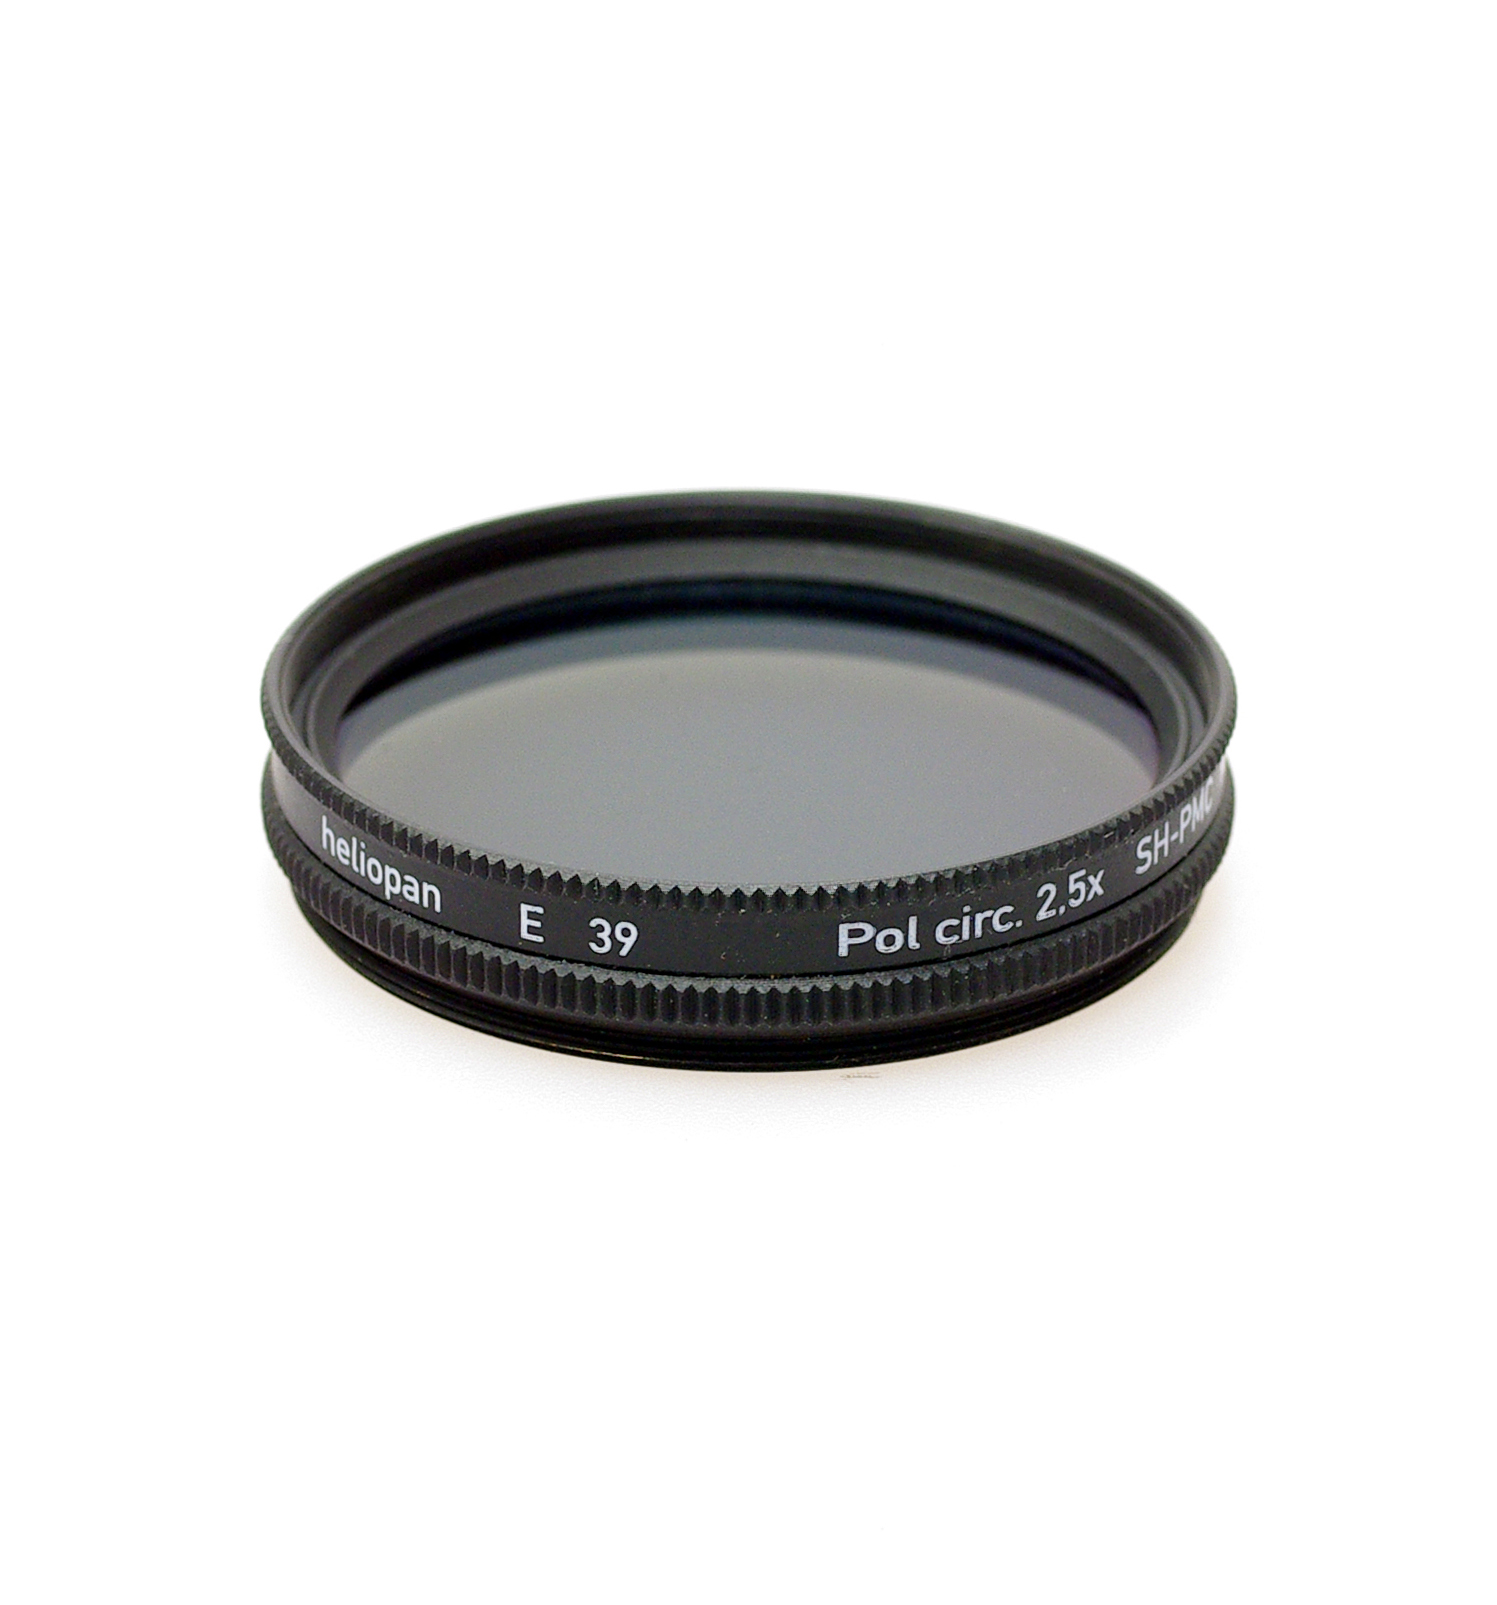 Heliopan sh-pmc (multi coated) circular polarising filter,39-105mm